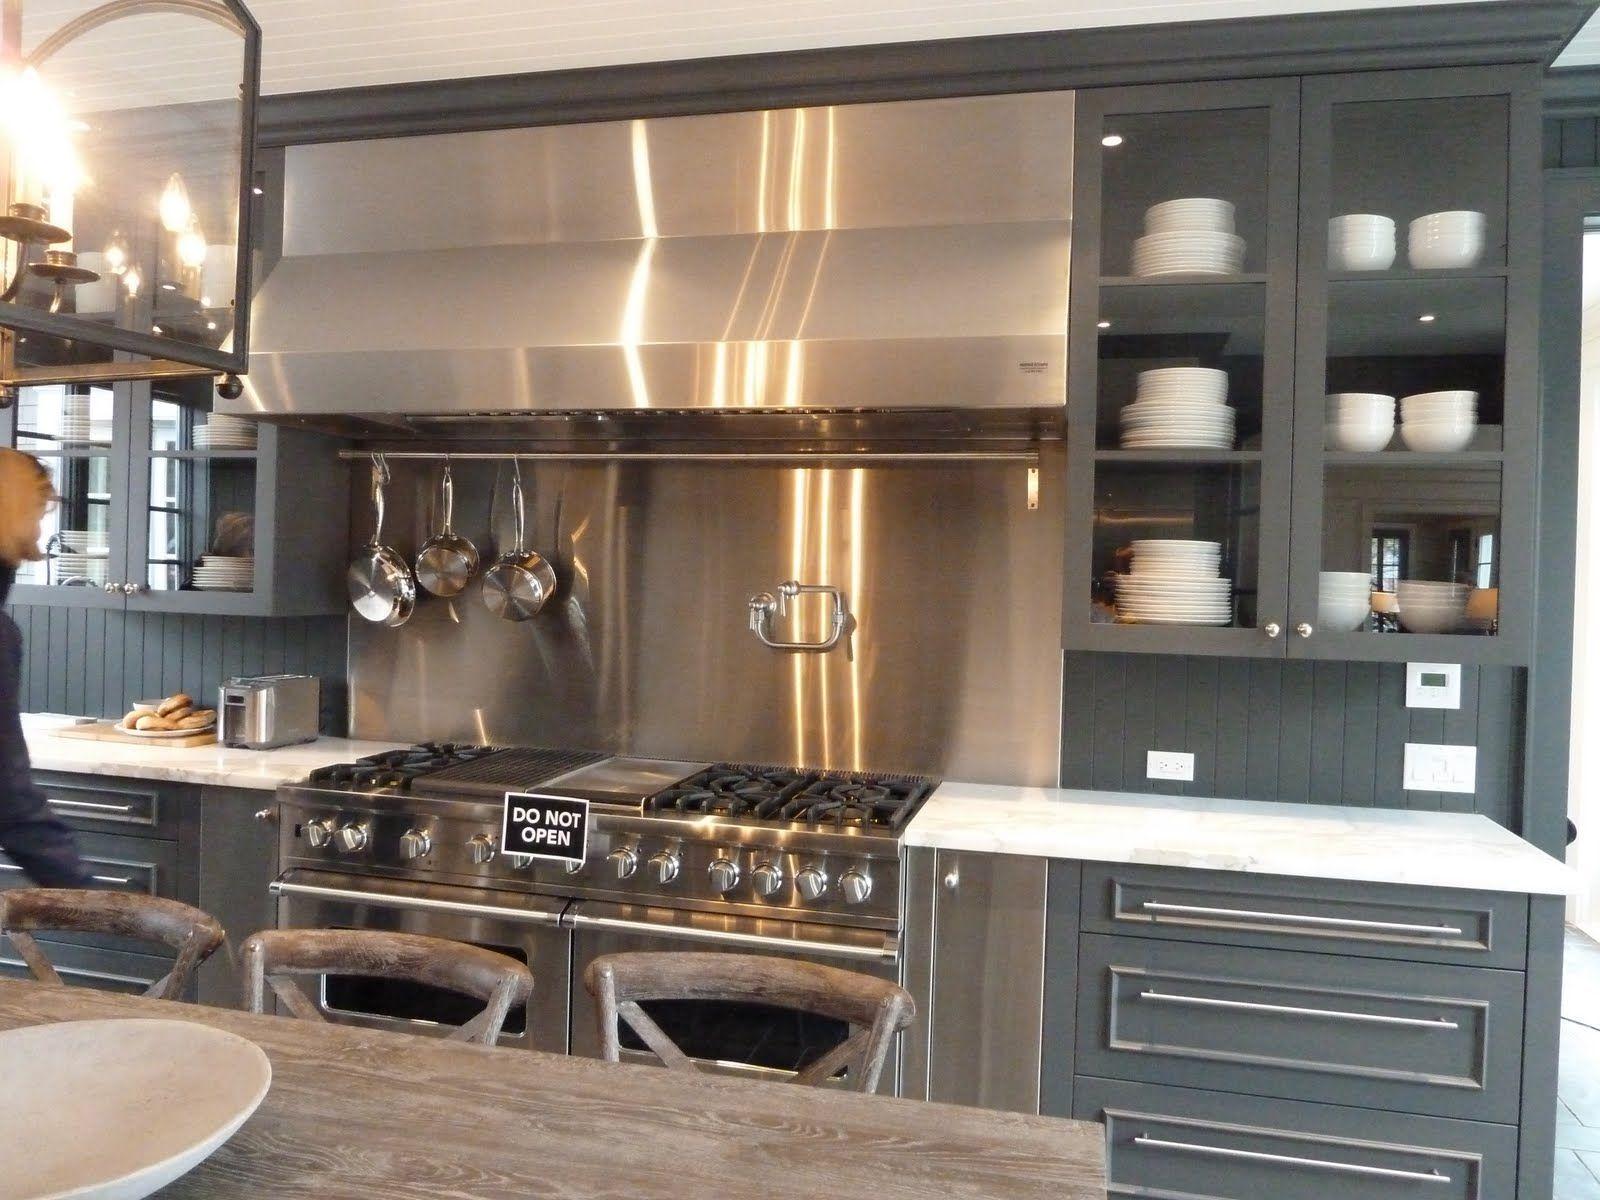 superb Industrial Stoves For Kitchens #1: Industrial Stoves For Kitchens Zitzat